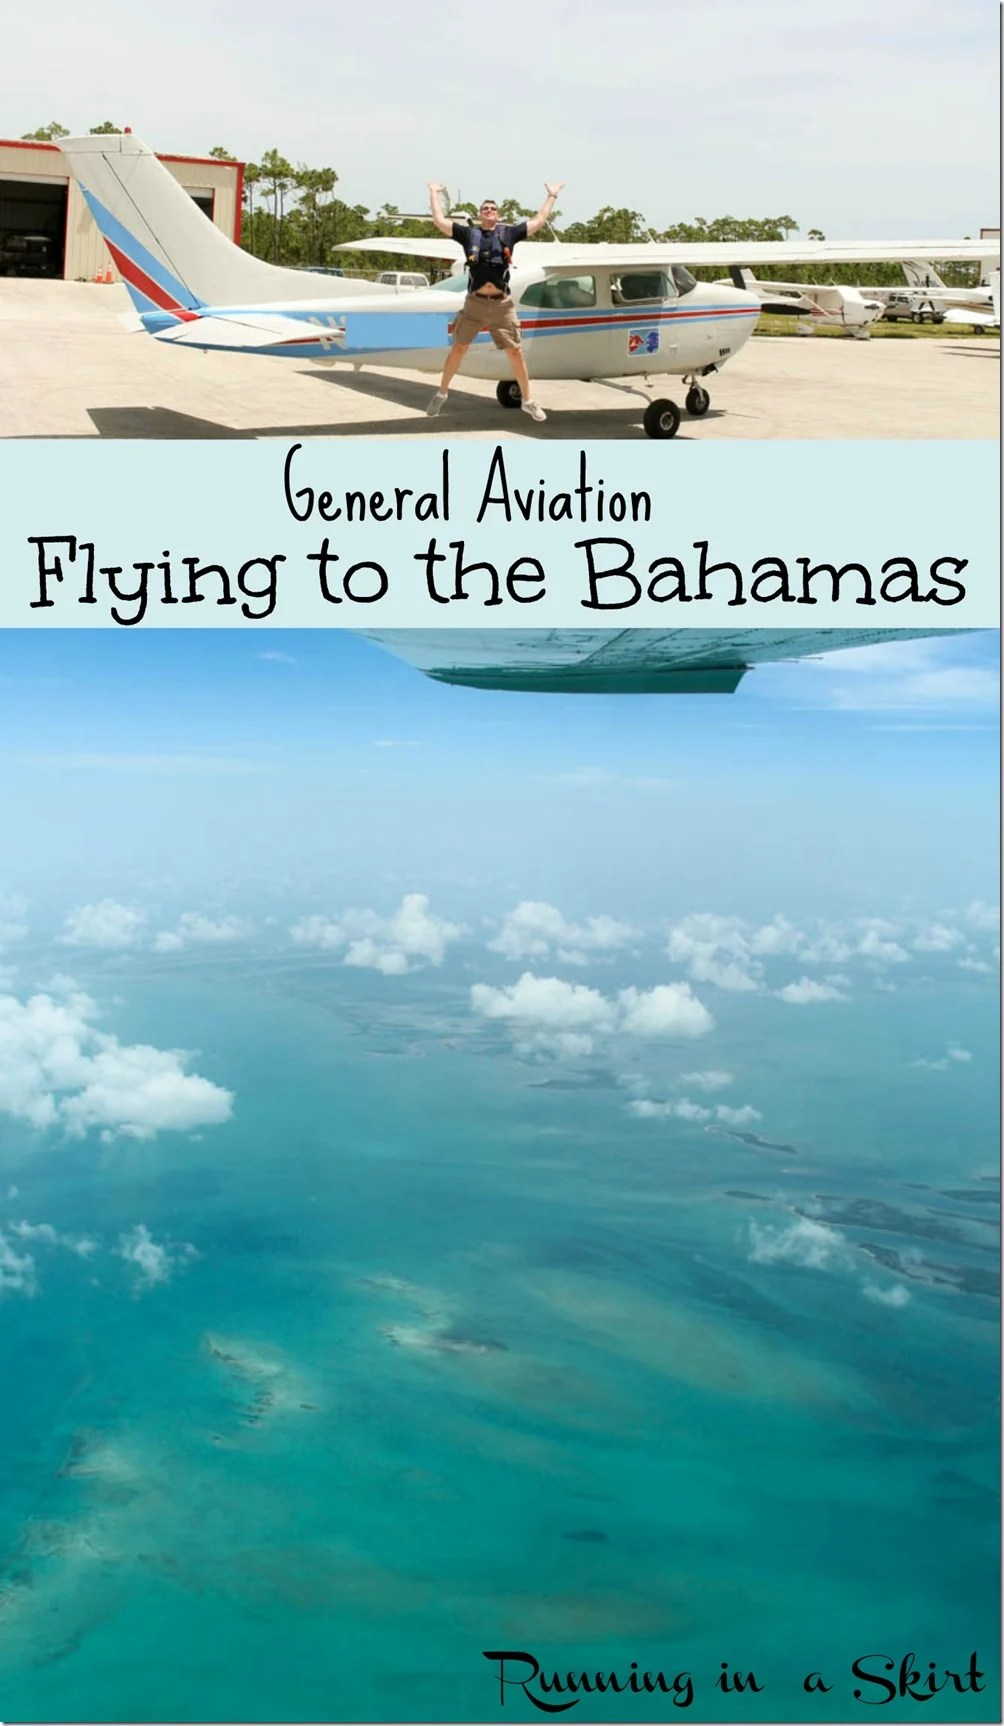 Bahamas landing giveaway